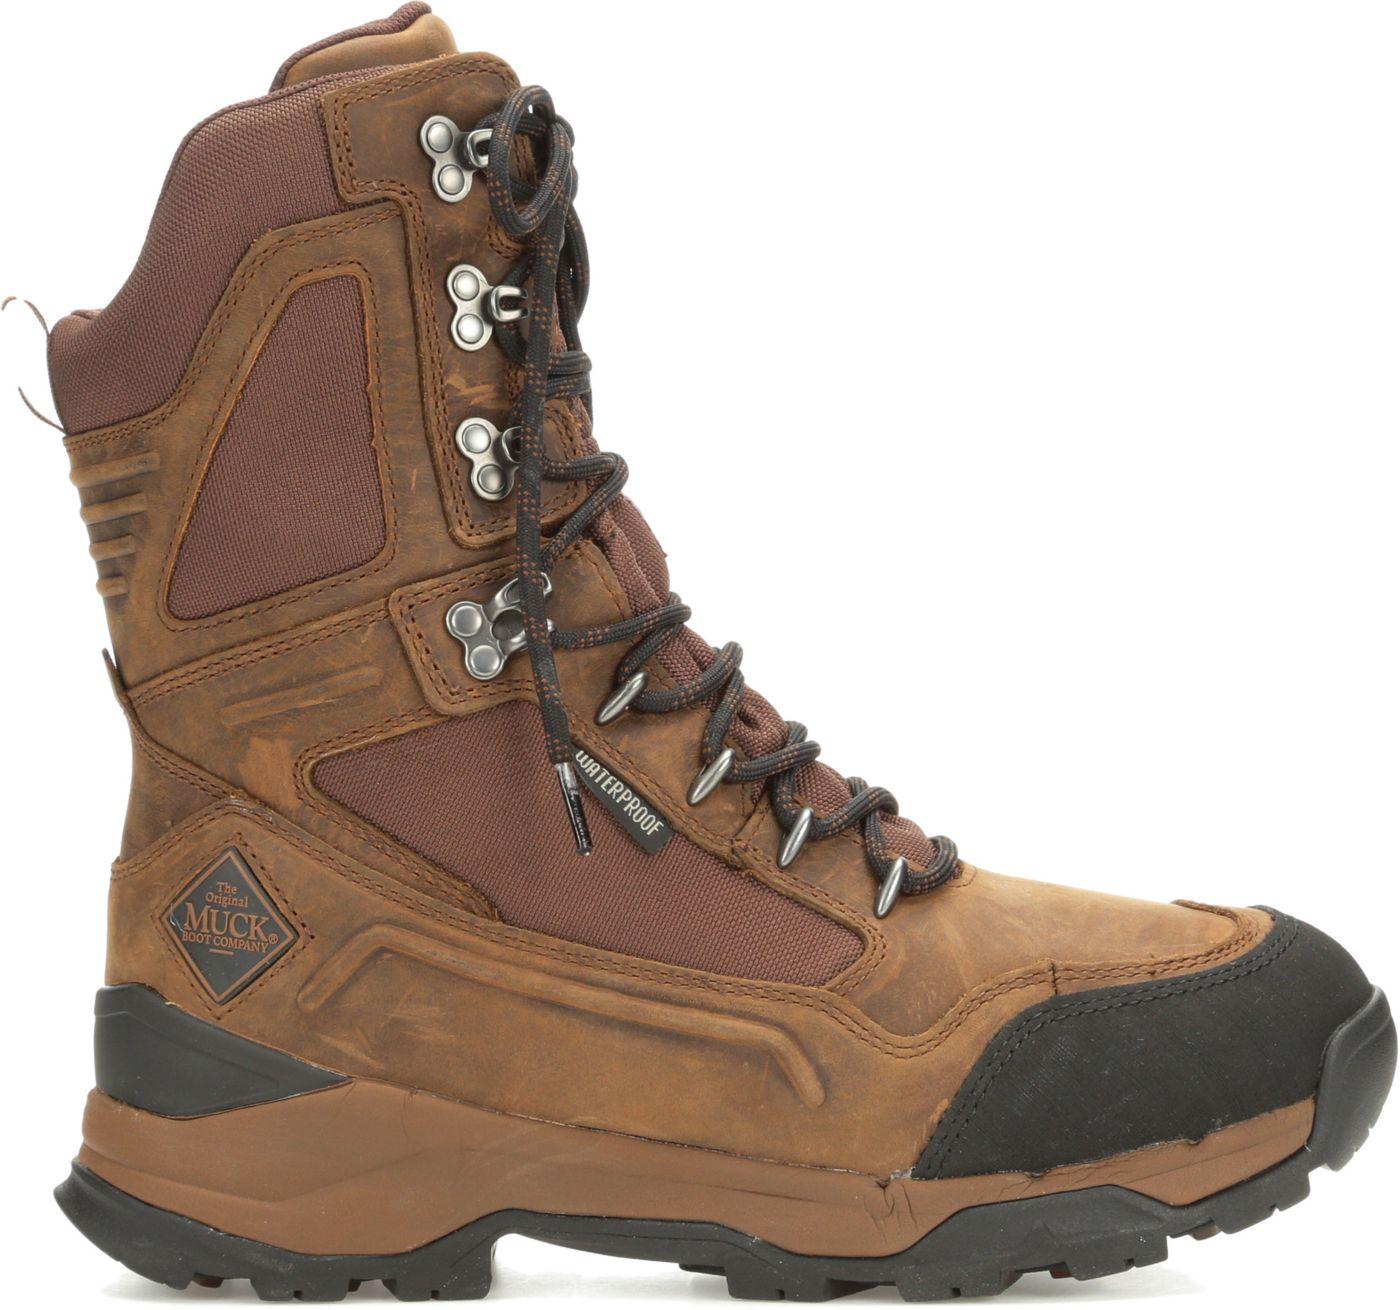 Muck Boots Men's Summit 10'' 800g Waterproof Field Hunting Boots